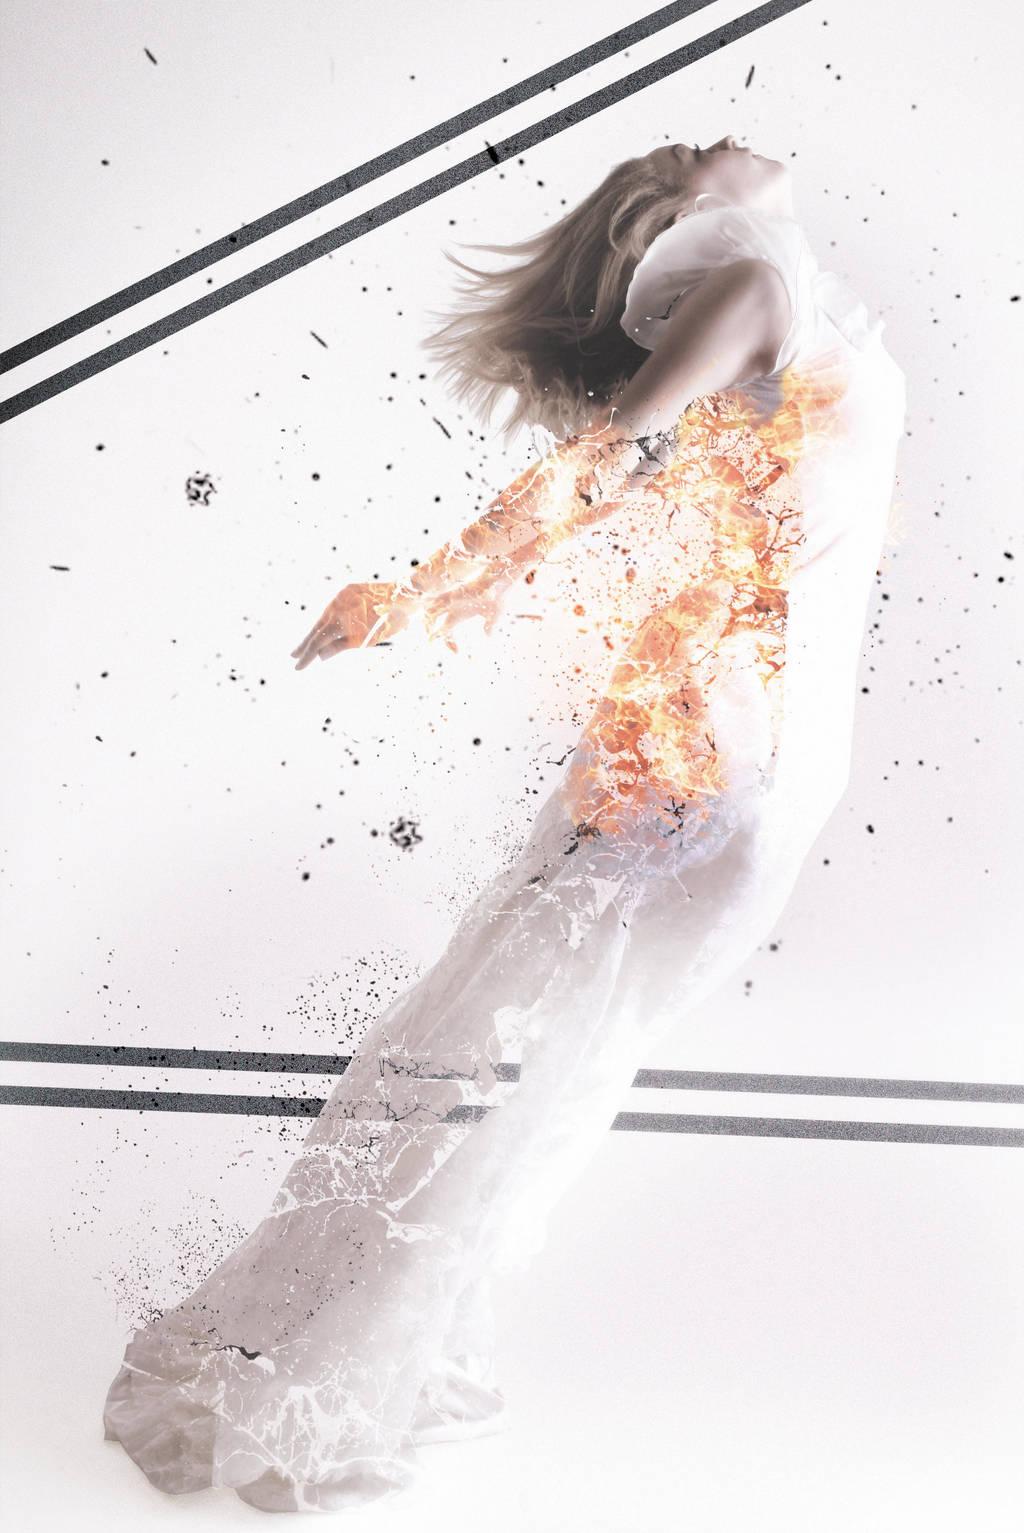 Flame imp by Misanthropics